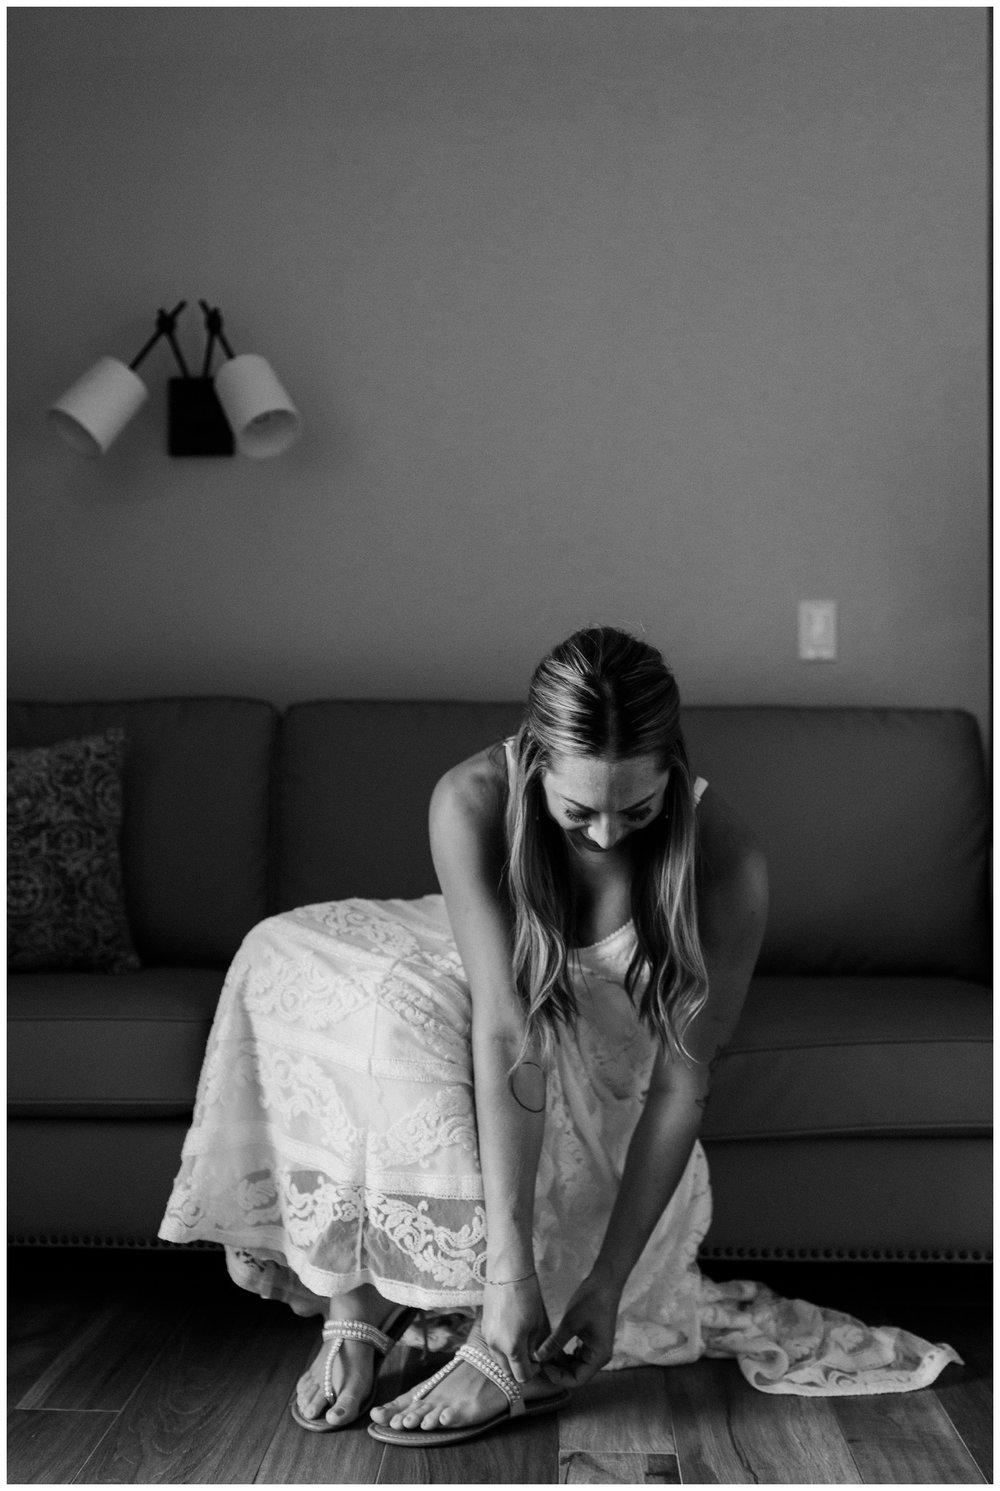 Napa Valley Backyard Wedding and Reception at Elizabeth Spencer Winery | Jessica Heron Images 027.jpg